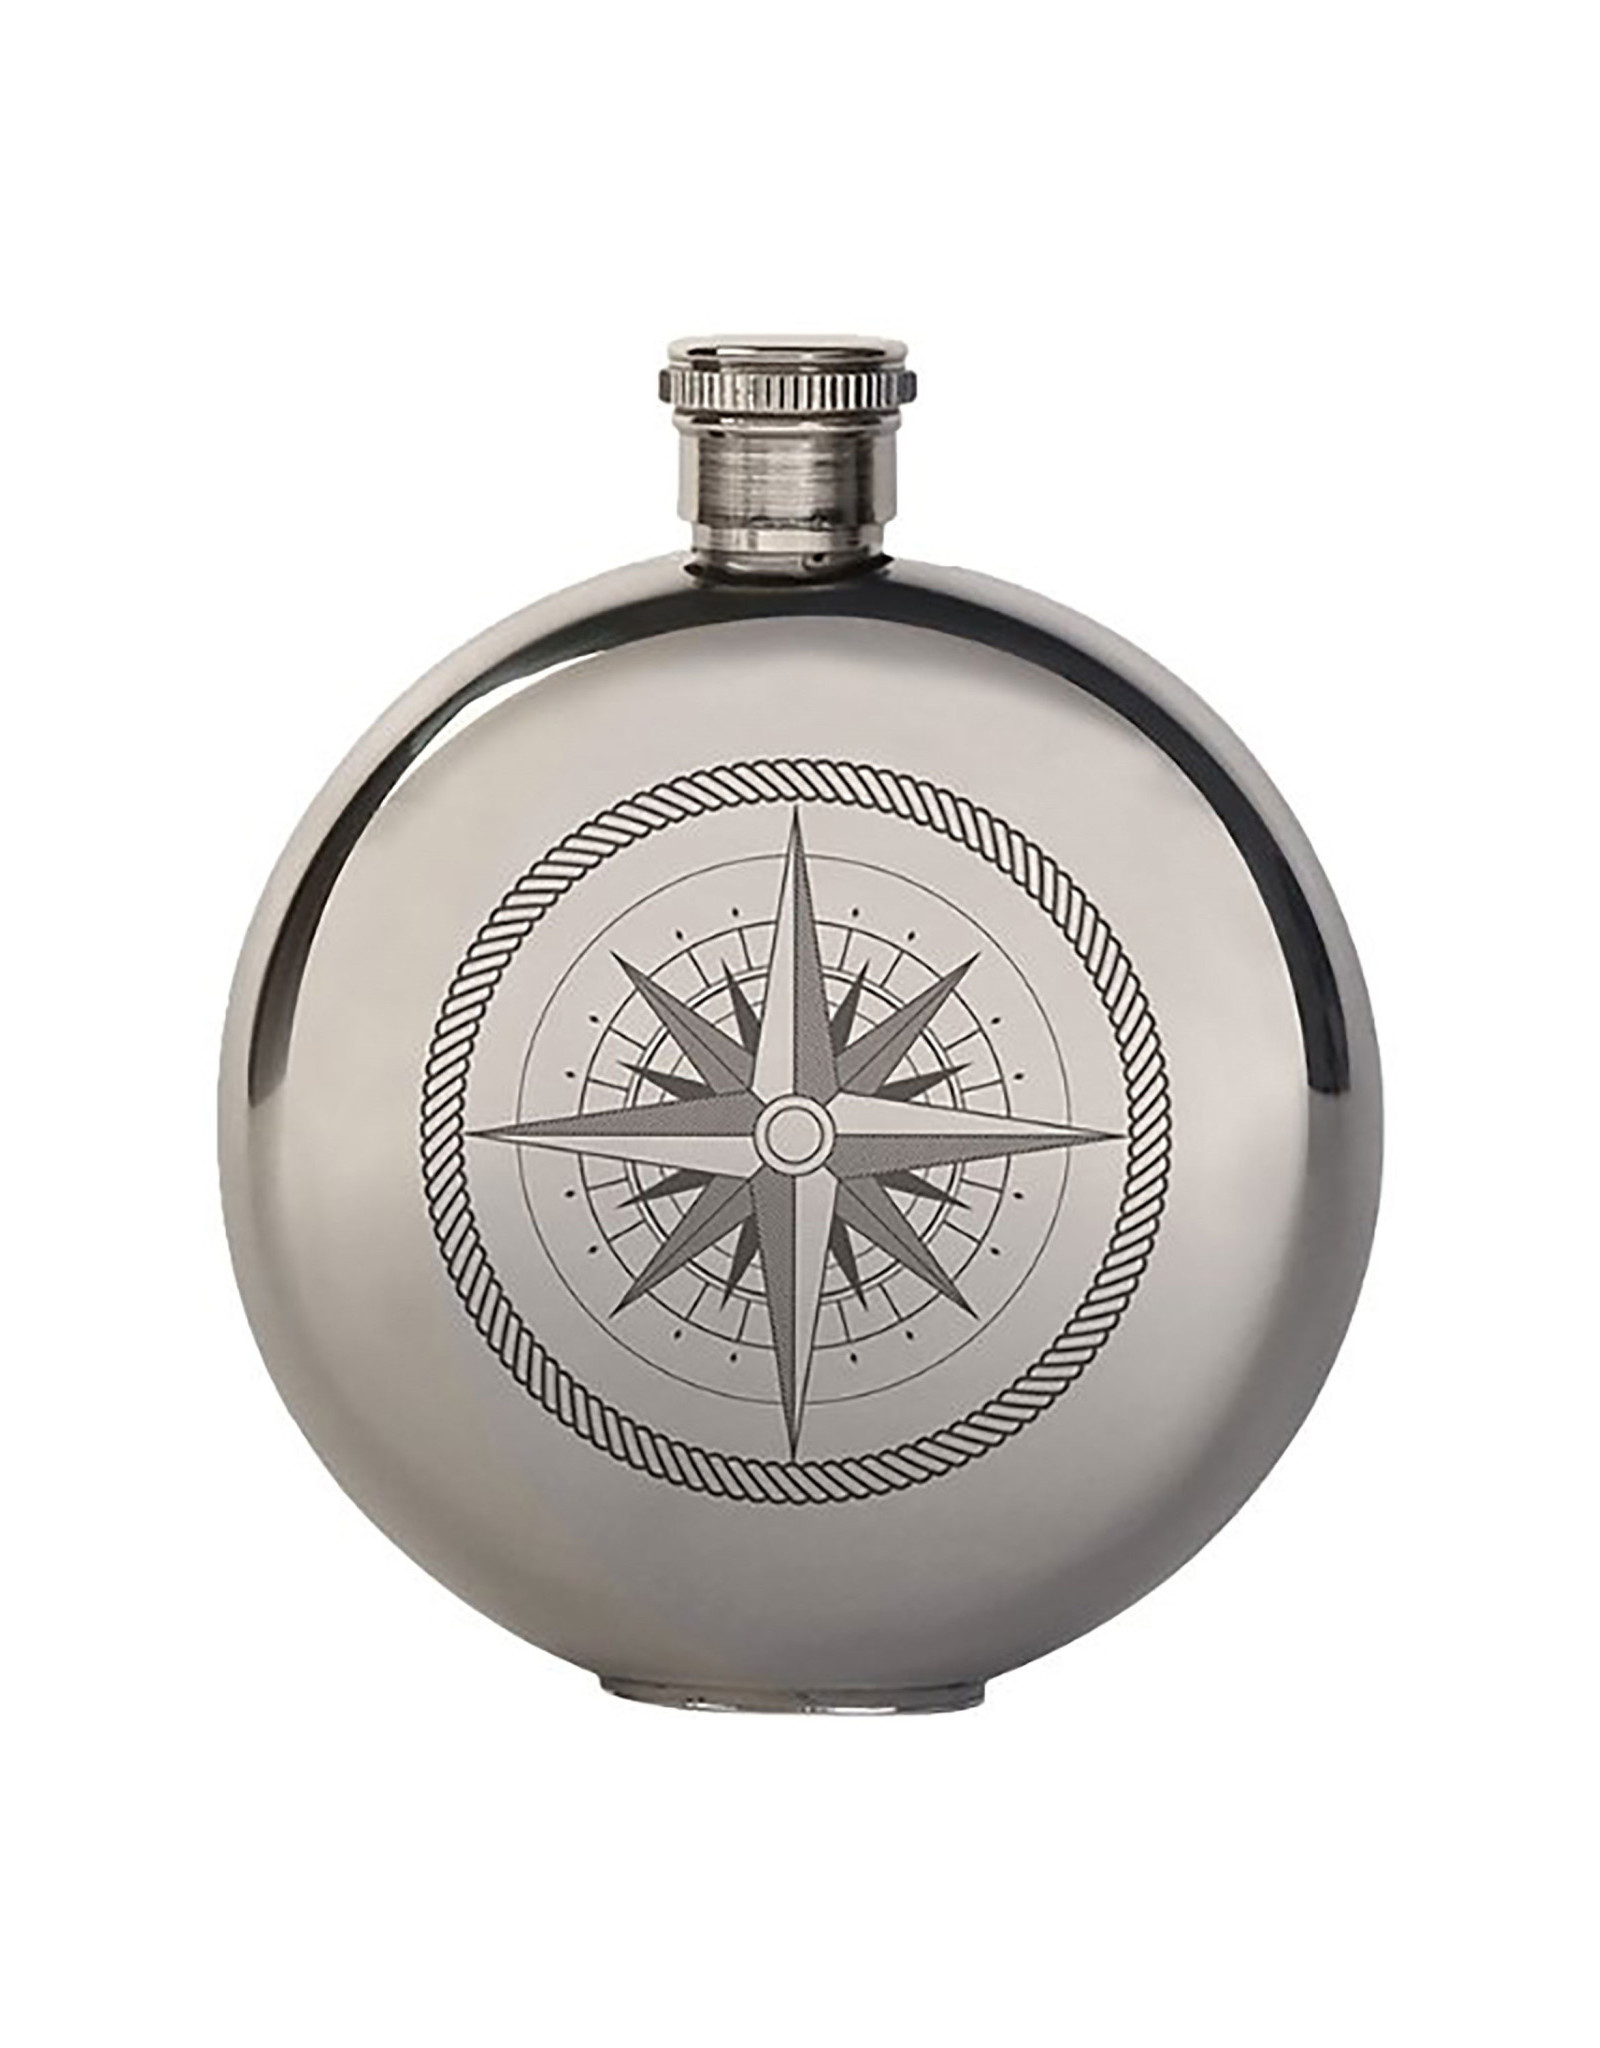 Kikkerland 5oz Compass Canteen Flask - Kikkerland